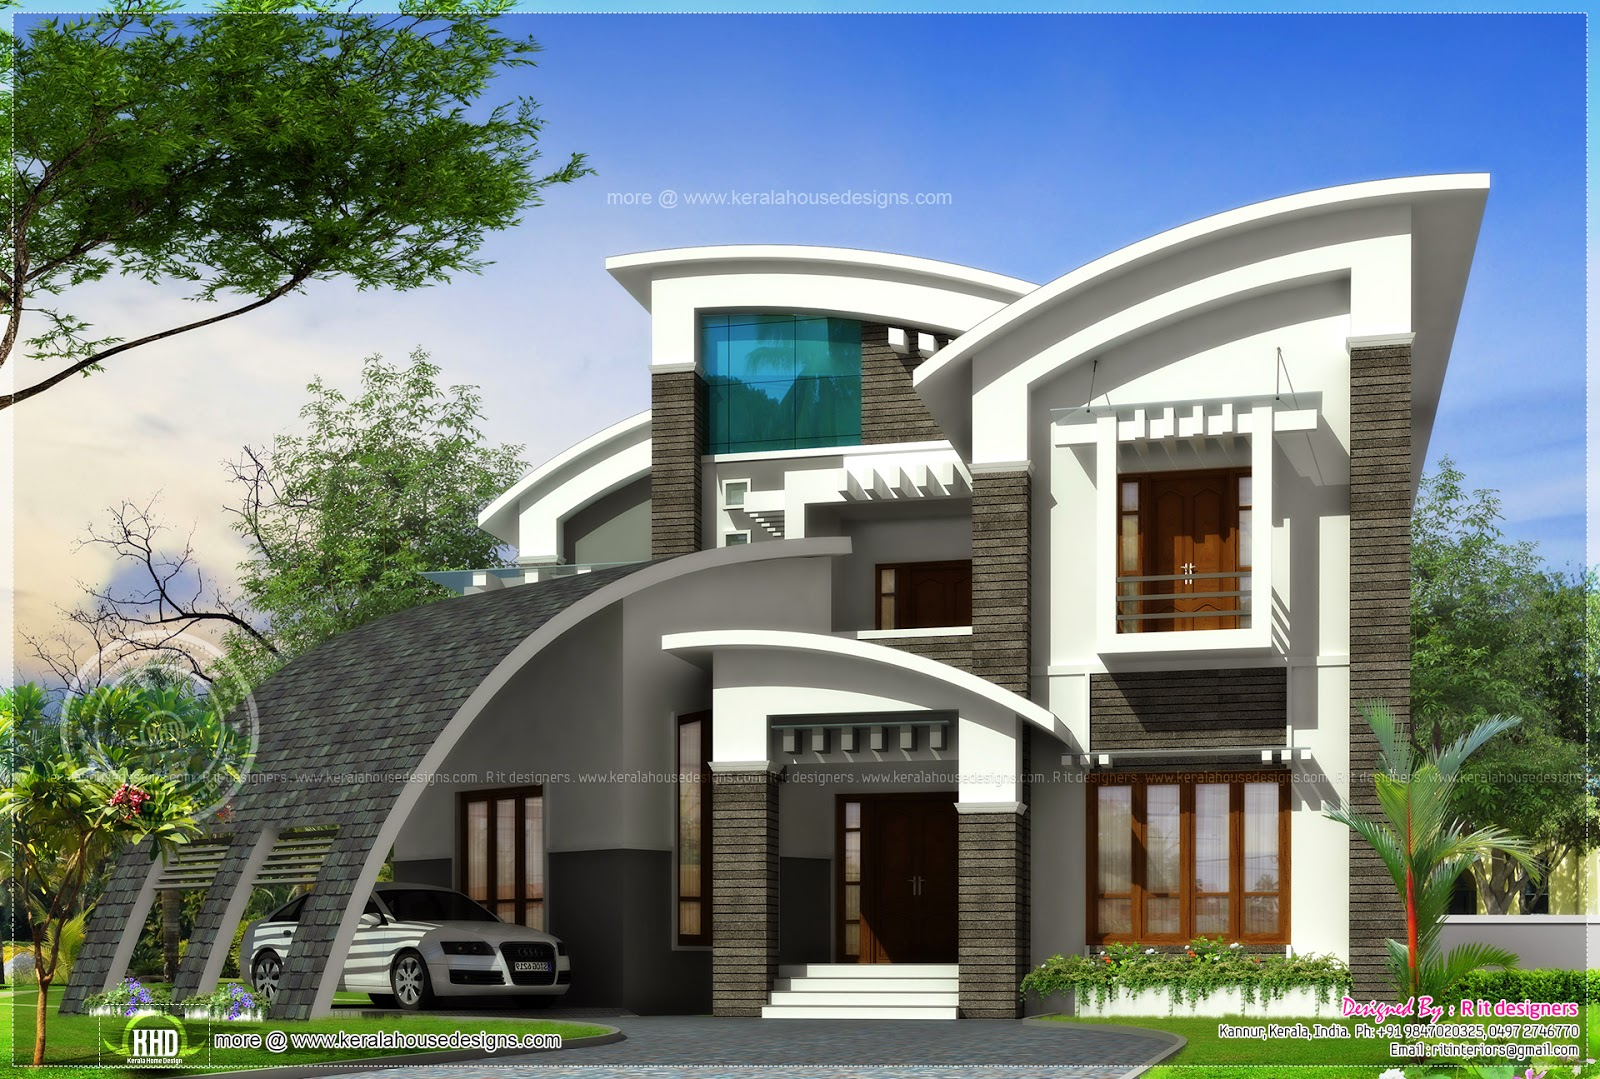 Super luxury ultra modern house design - Kerala home ...